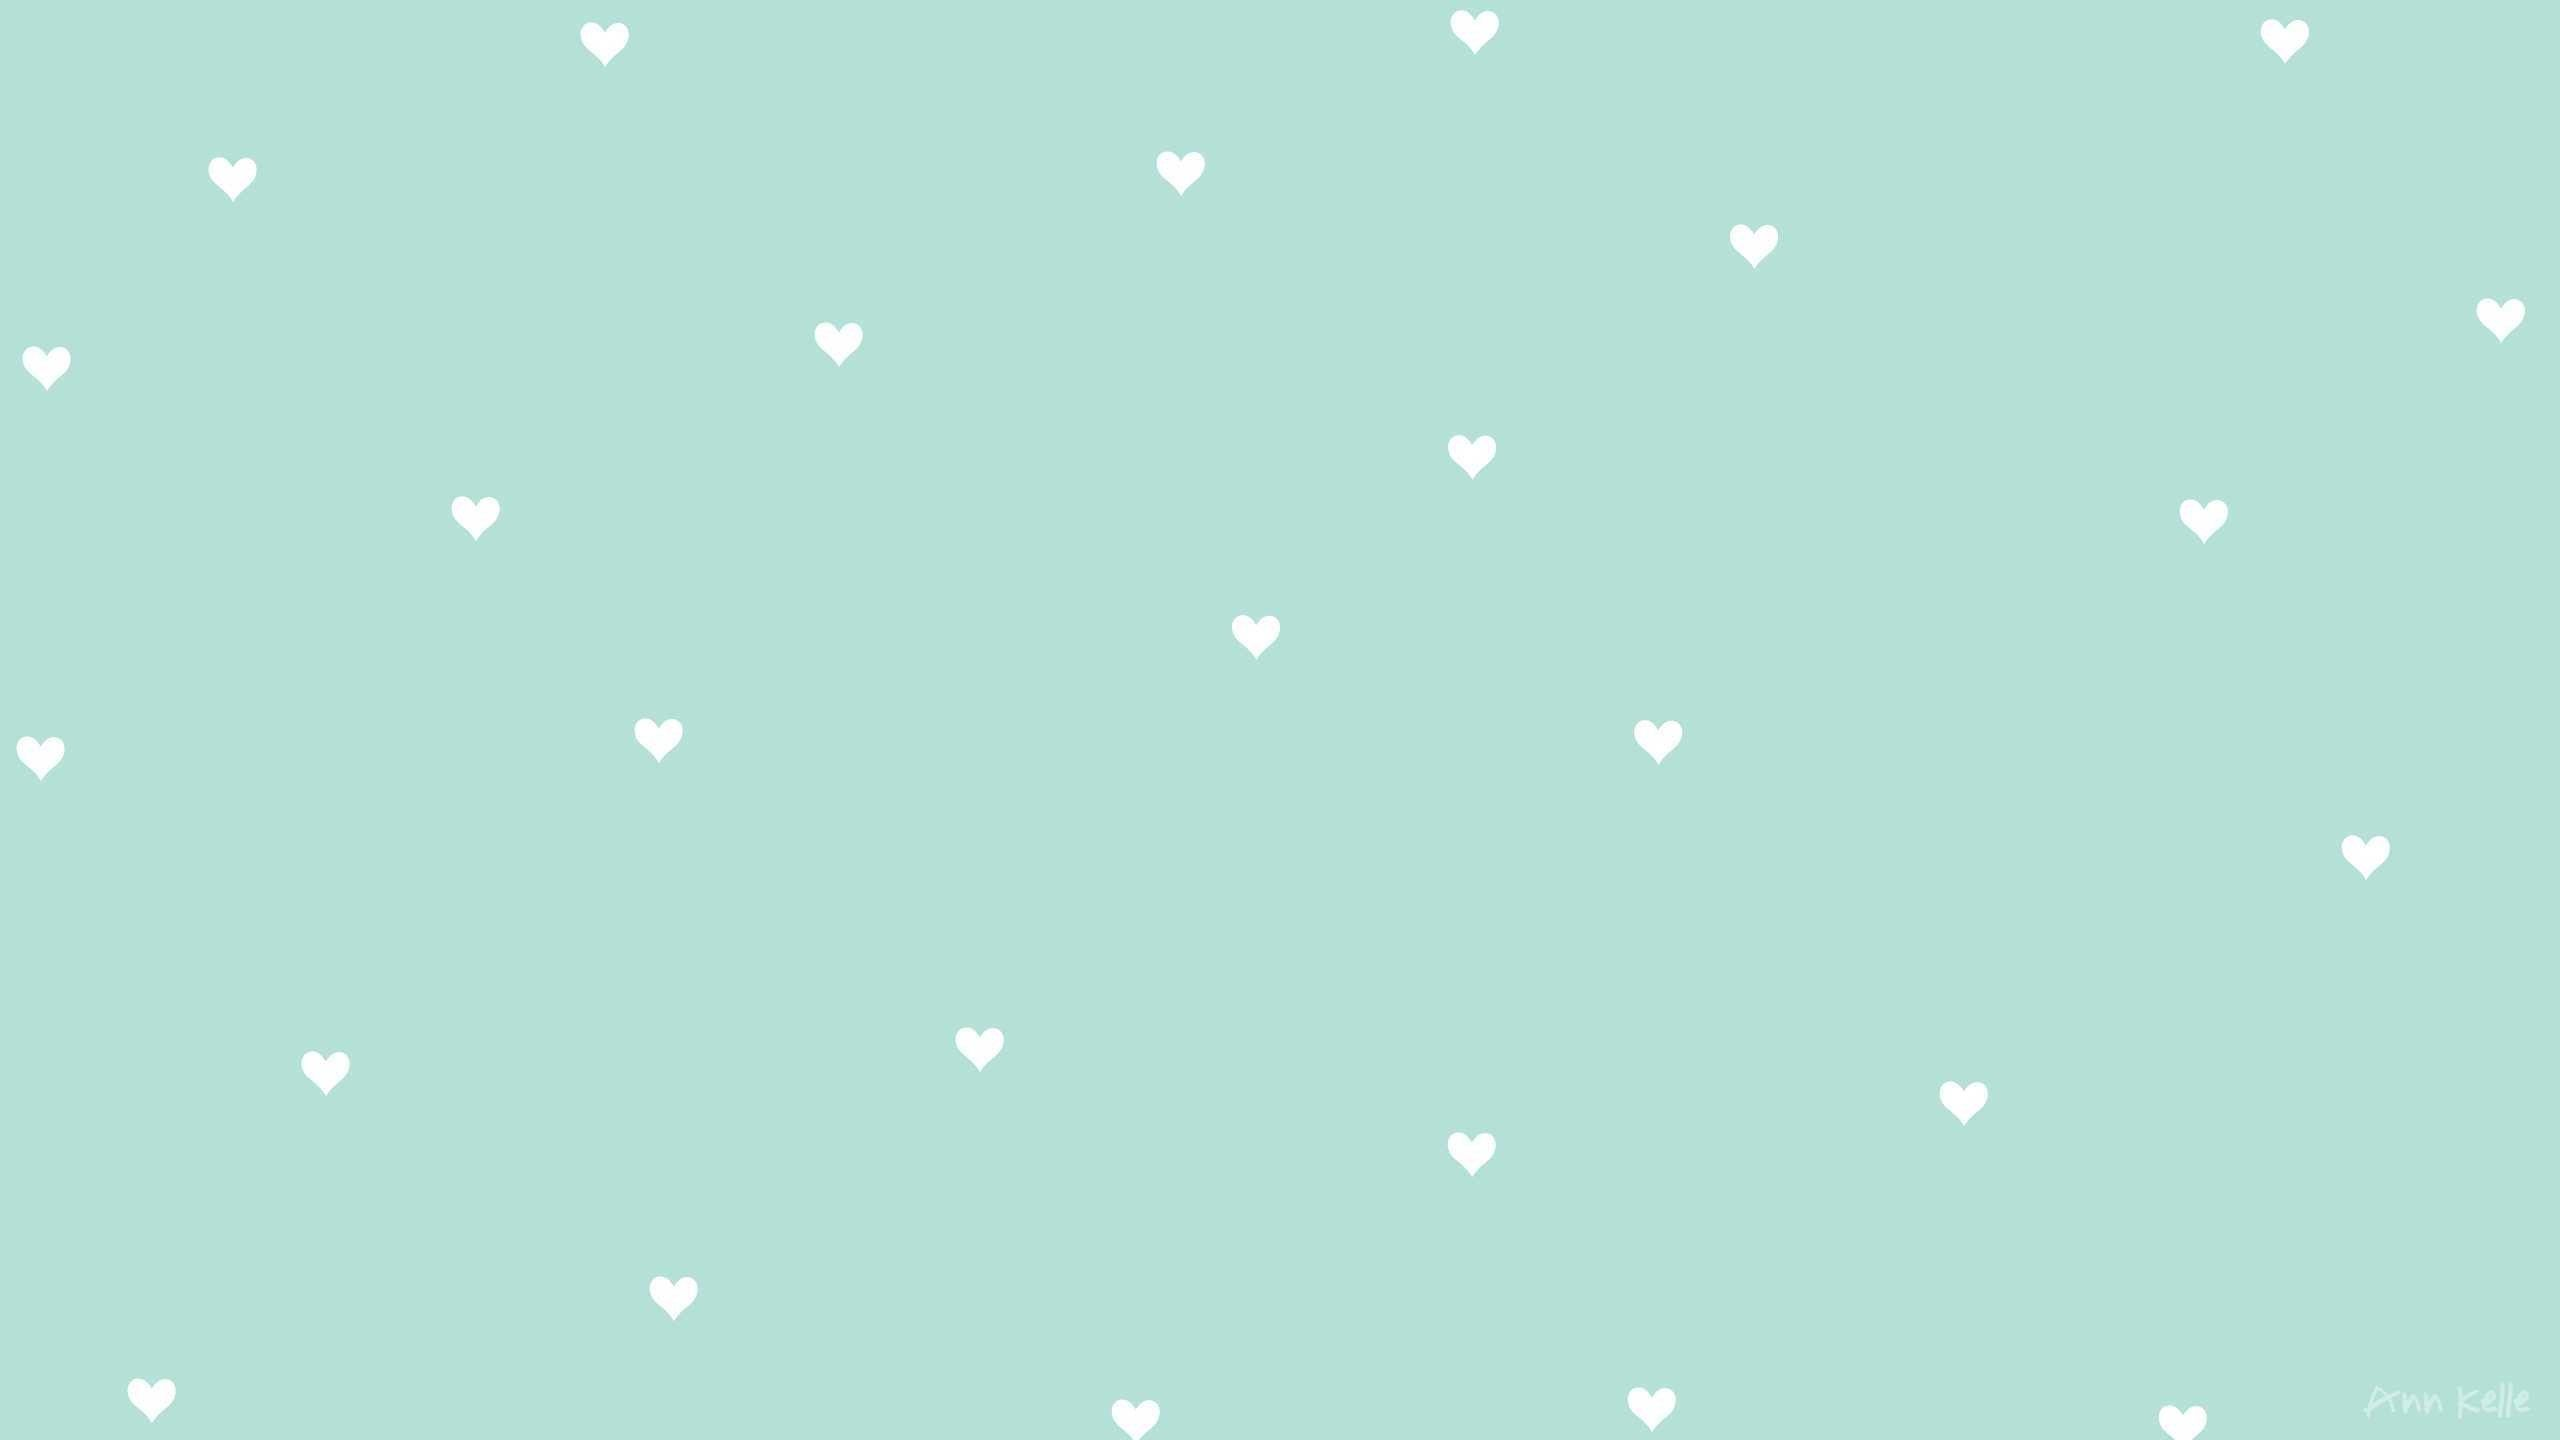 Pastel Blue Aesthetic Desktop Wallpapers Top Free Pastel Blue Aesthetic Desktop Backgrounds Wallpaperaccess Inspired/based on the colour blue as the aesthetic is popular cute. pastel blue aesthetic desktop